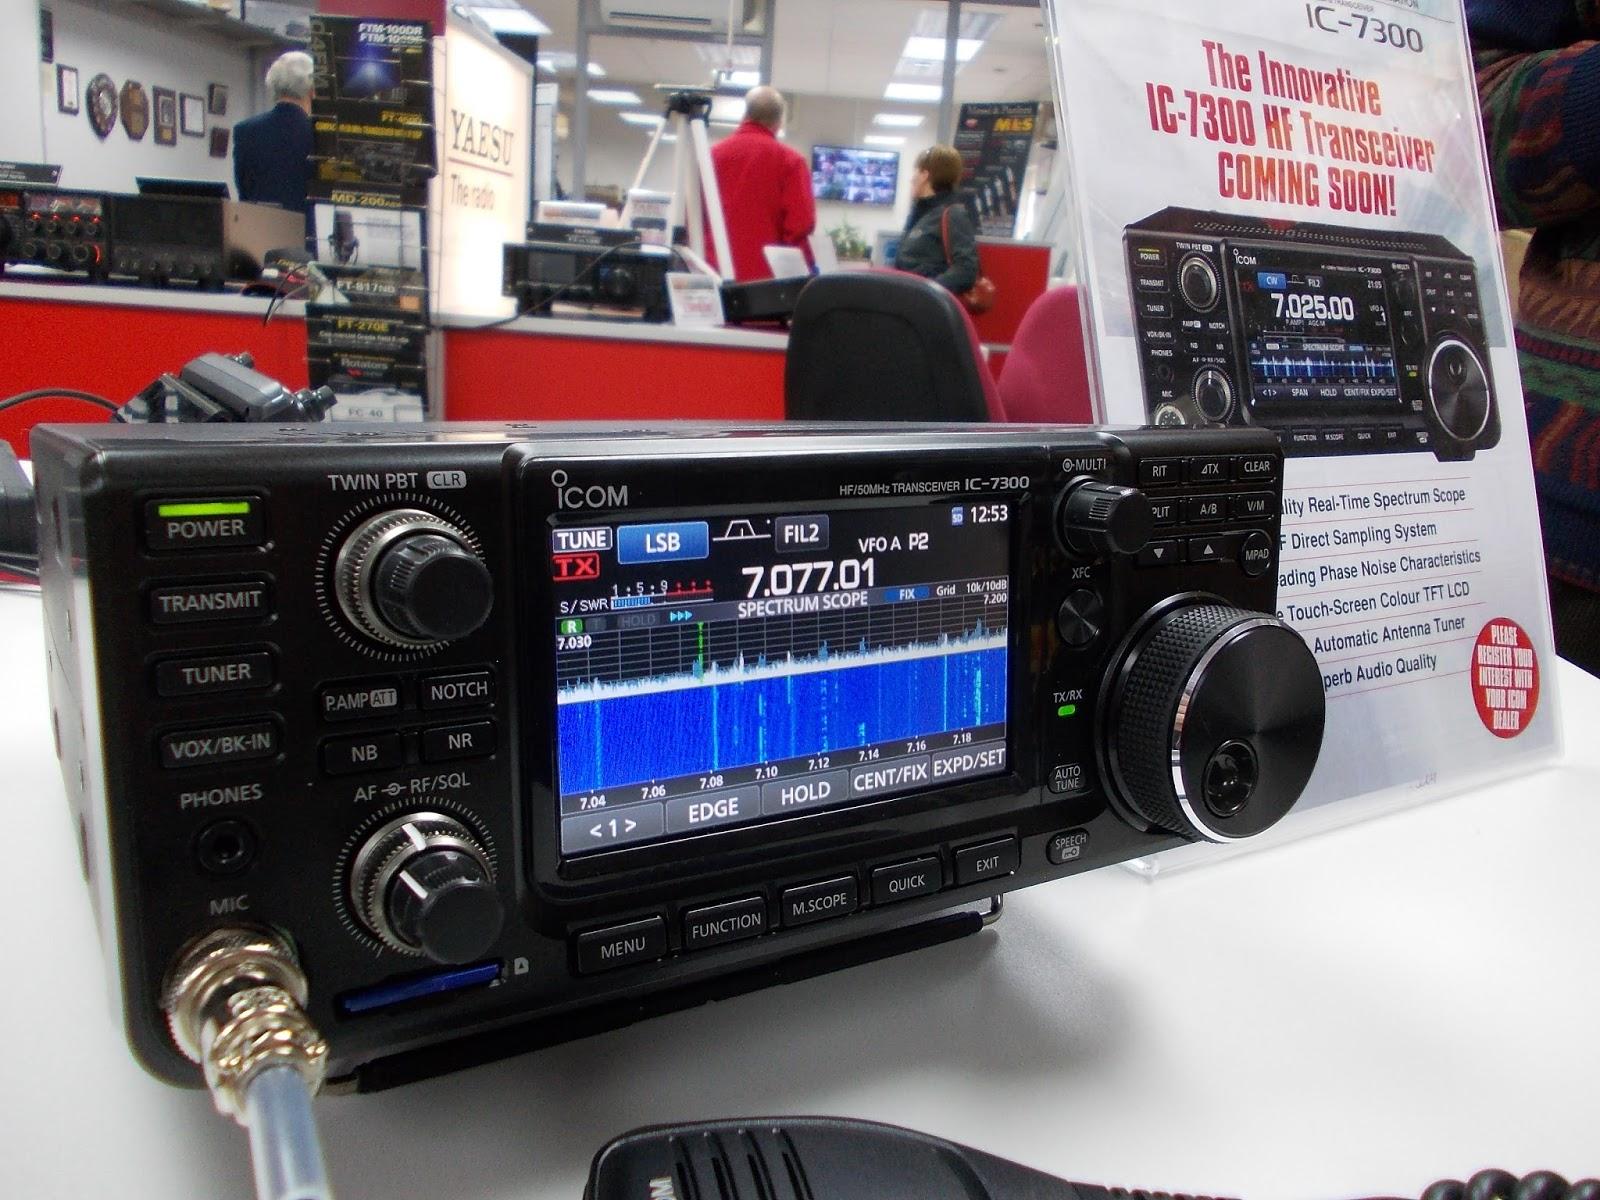 Icom IC-7300 review